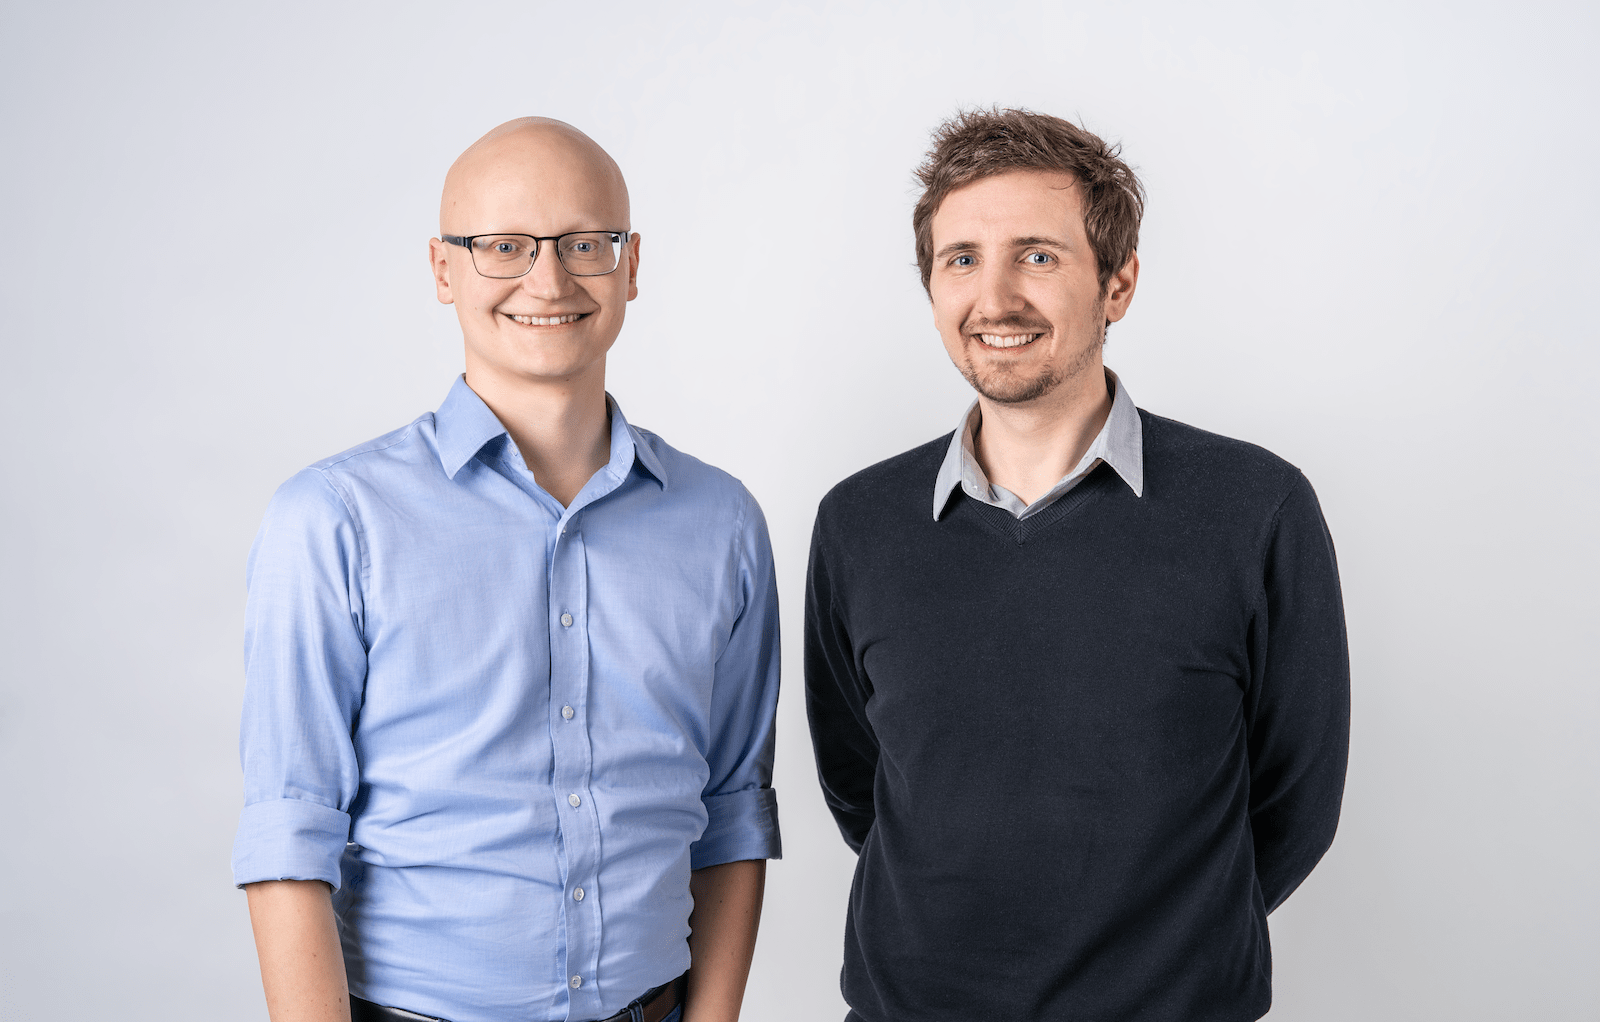 Kaleido AI founders, Benjamin Groessing and David Fankhauser.